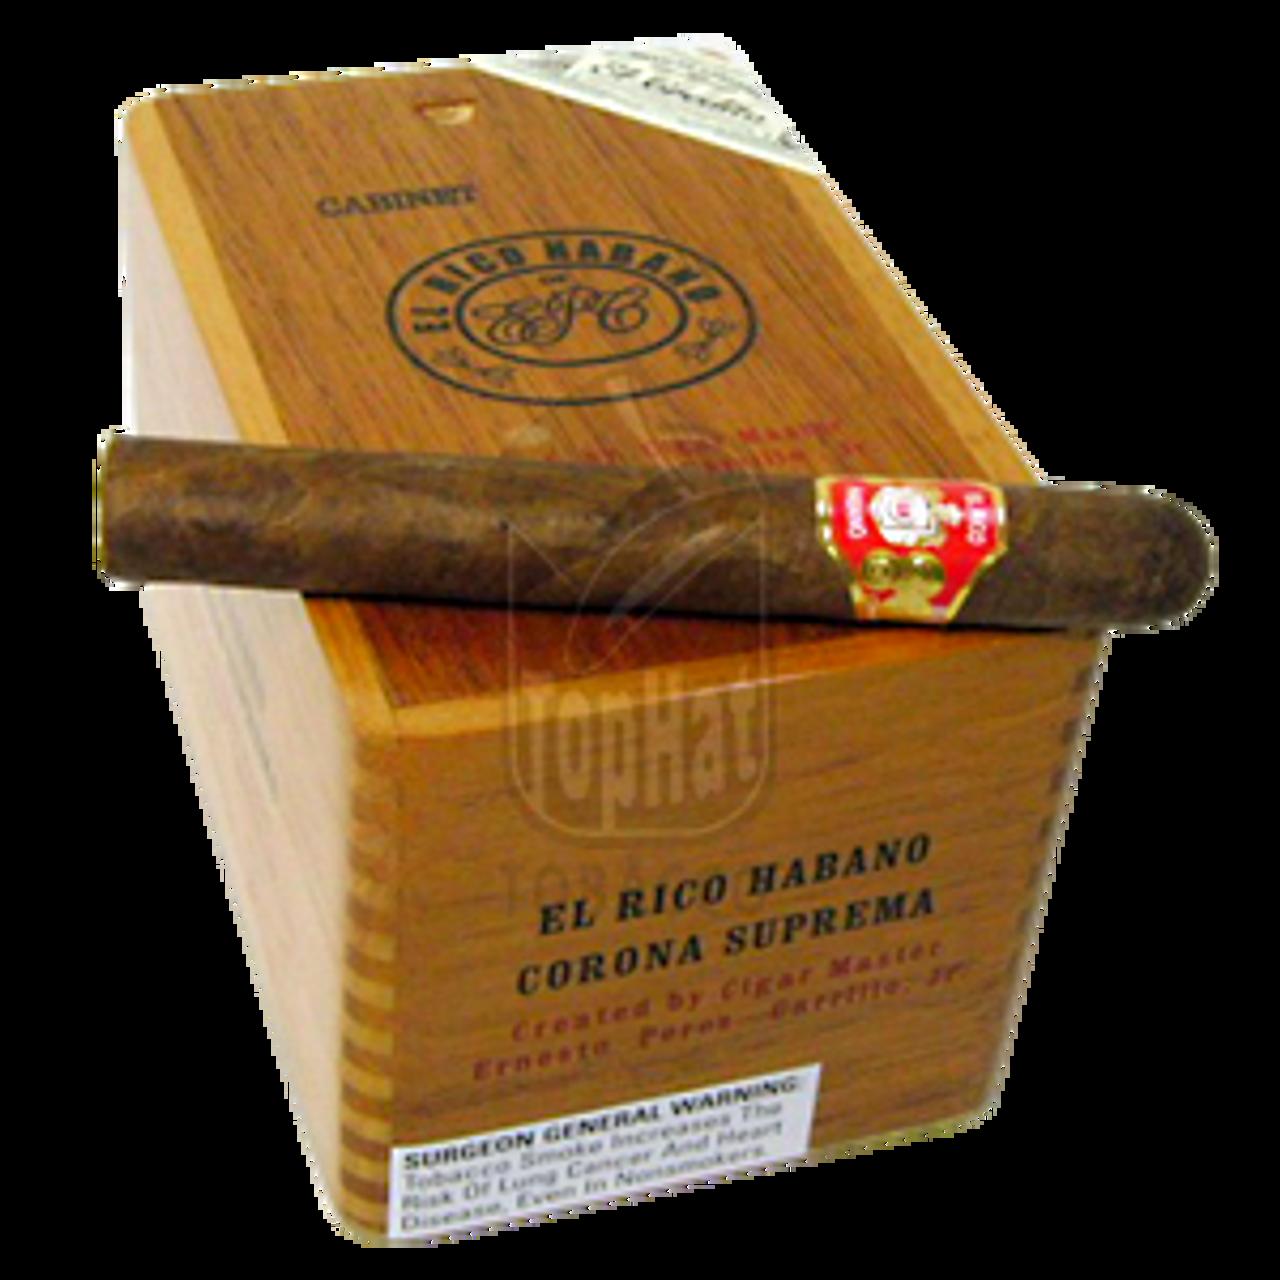 El Rico Habano Corona Suprema Cigars - 6 x 50 (Box of 25)